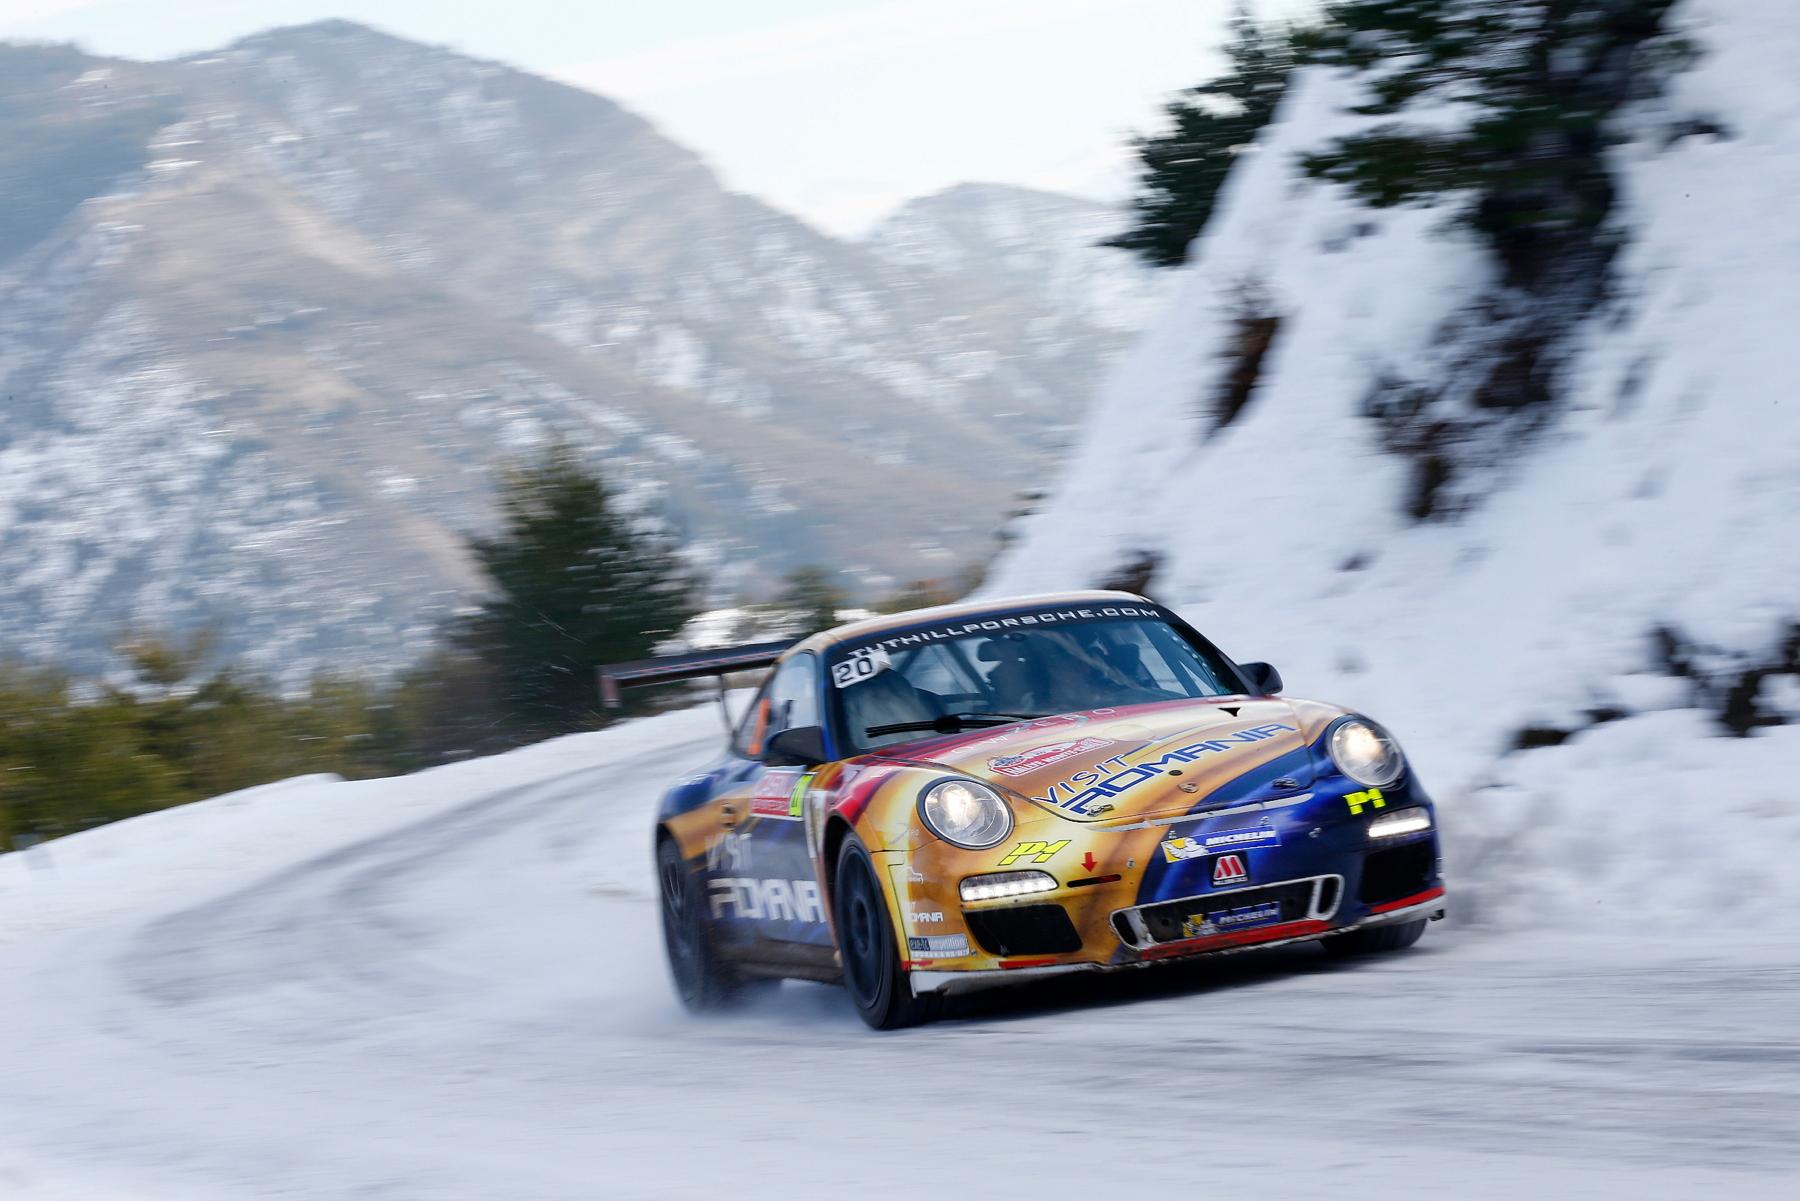 Porsche en hiver - Page 5 Francois-delecour-tuthill-porsche-monte-3